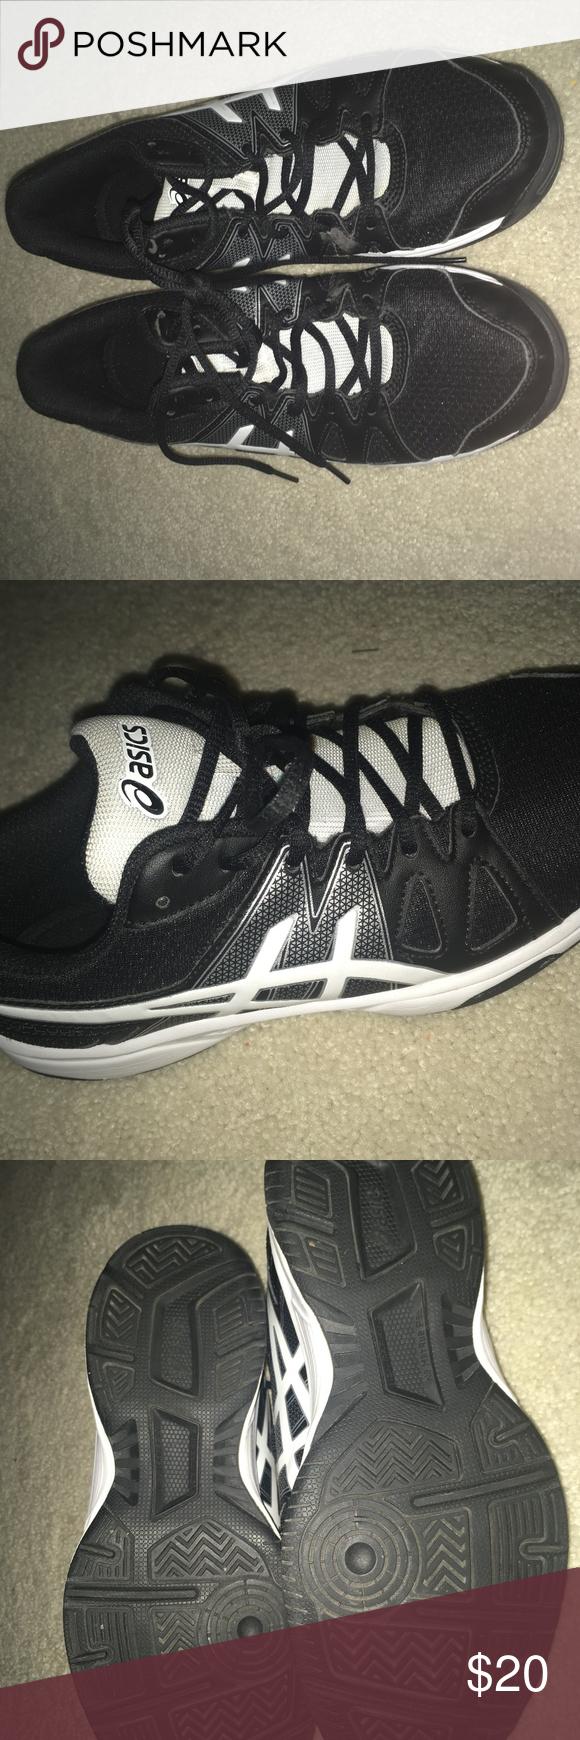 Volleyball Shoes Volleyball Shoes Shoes Asics Shoes